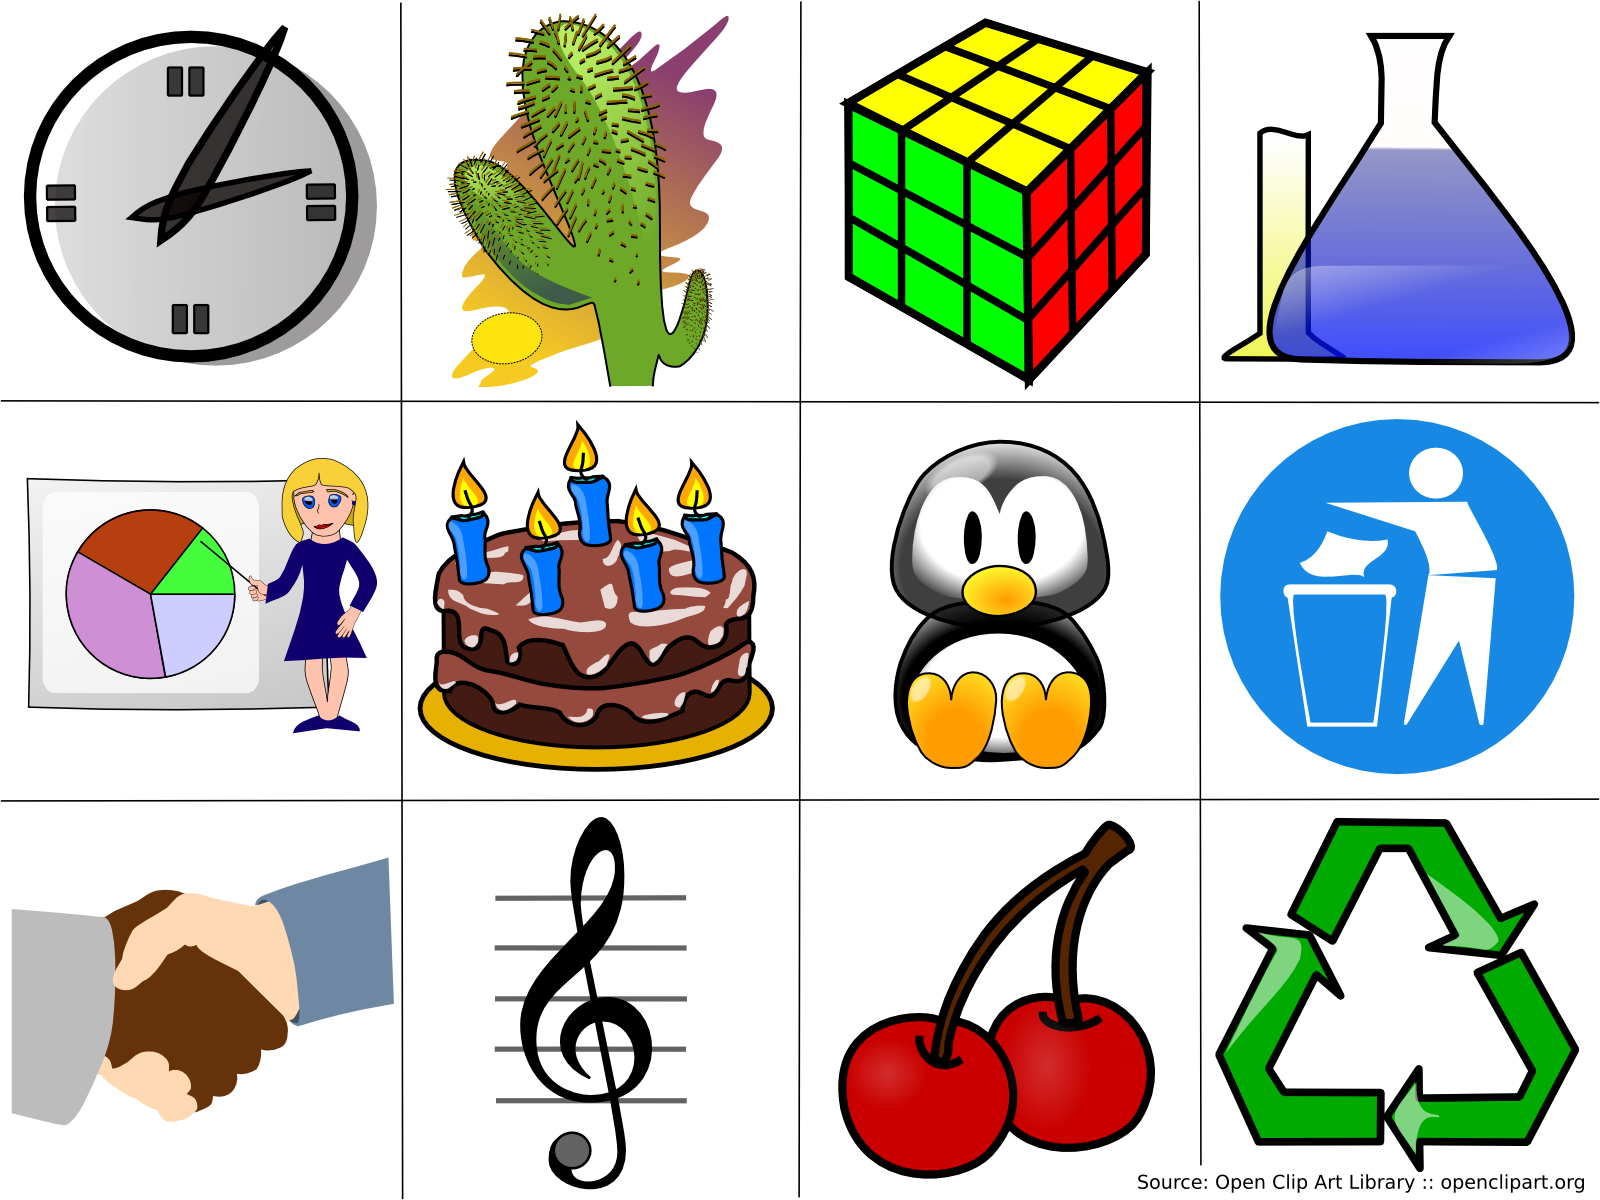 ... Microsoft Office Clip Art Free Image-... Microsoft Office Clip Art Free Images ...-8